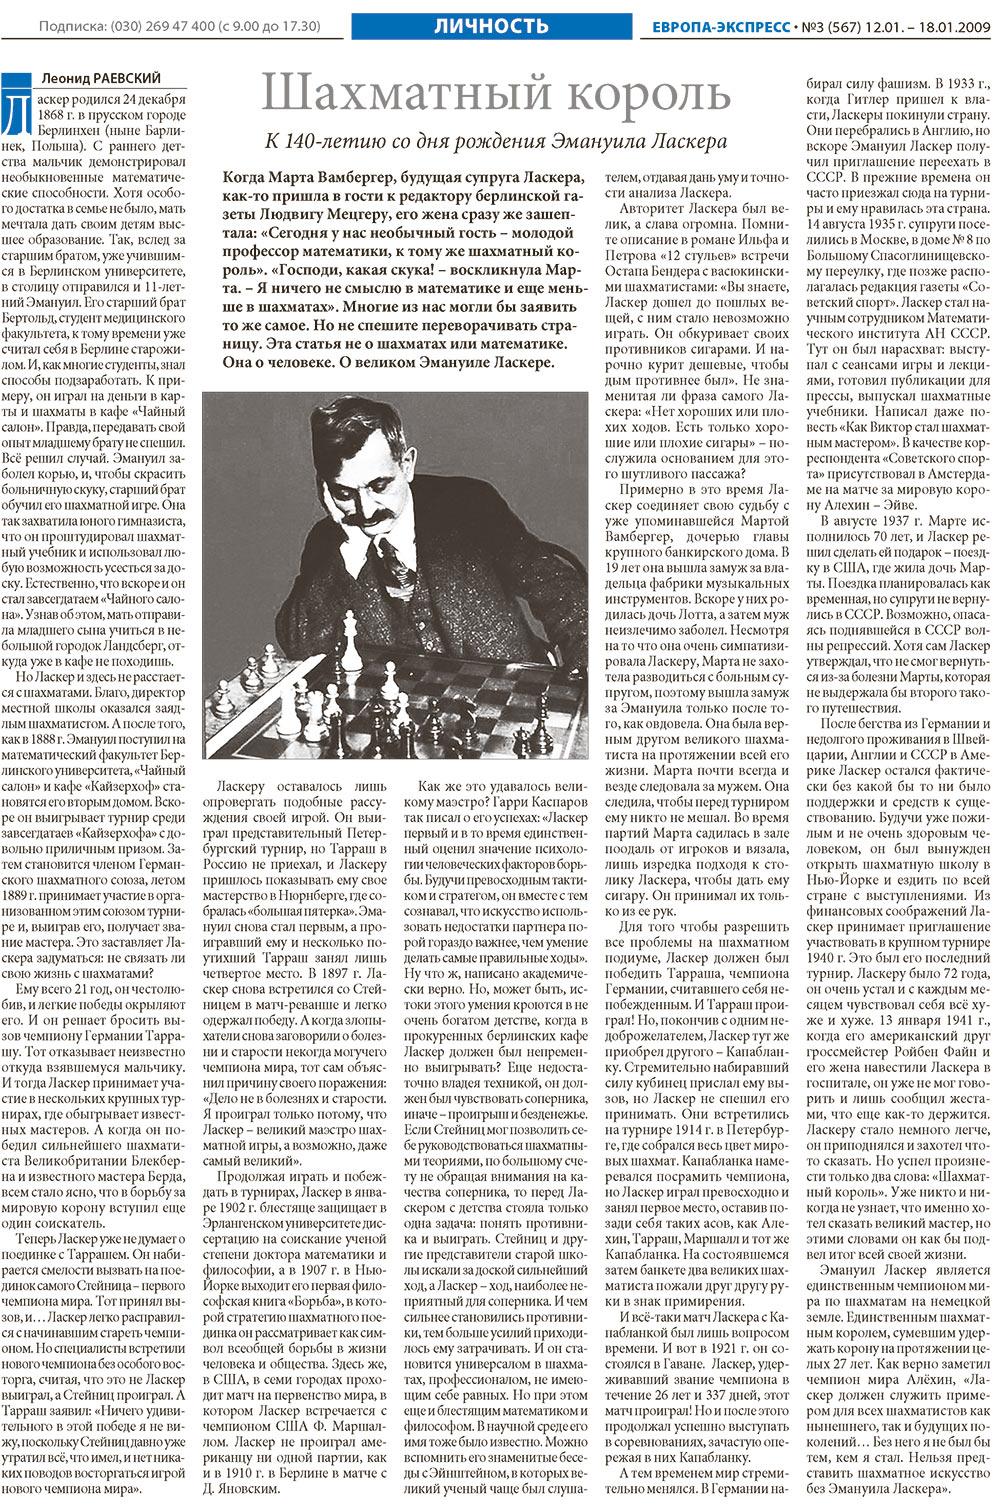 Европа экспресс (газета). 2009 год, номер 1, стр. 18